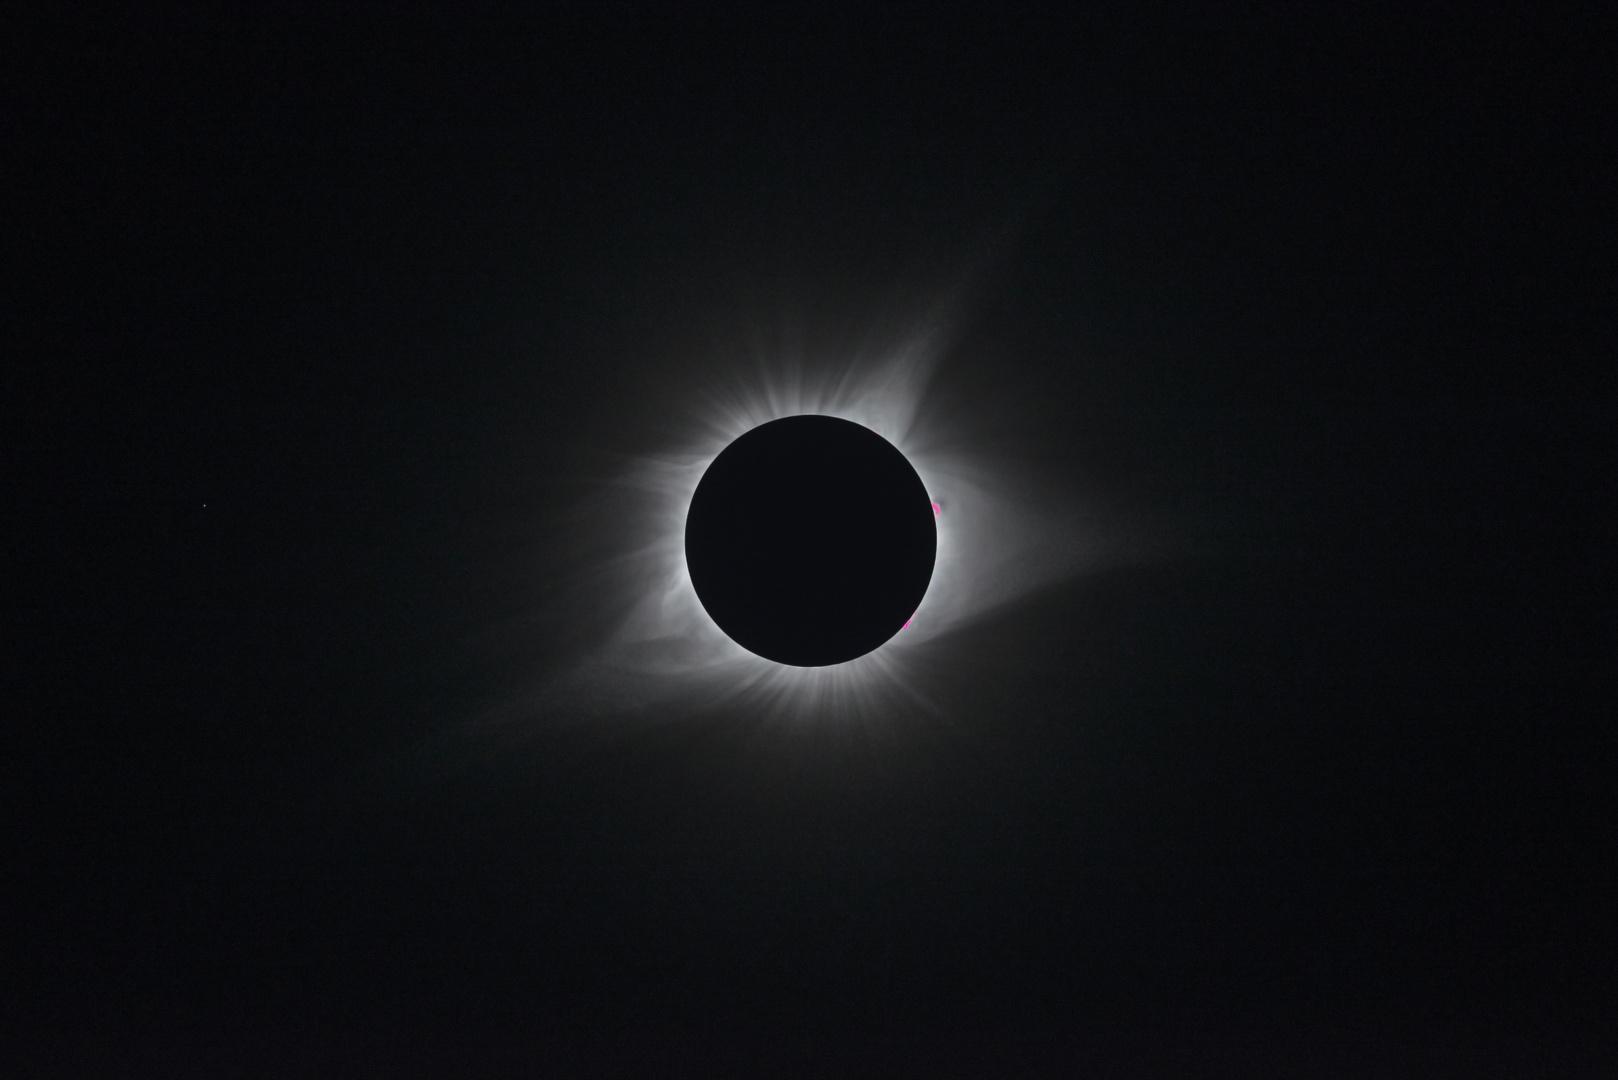 Totale Sonnenfinsternis USA 2017 I